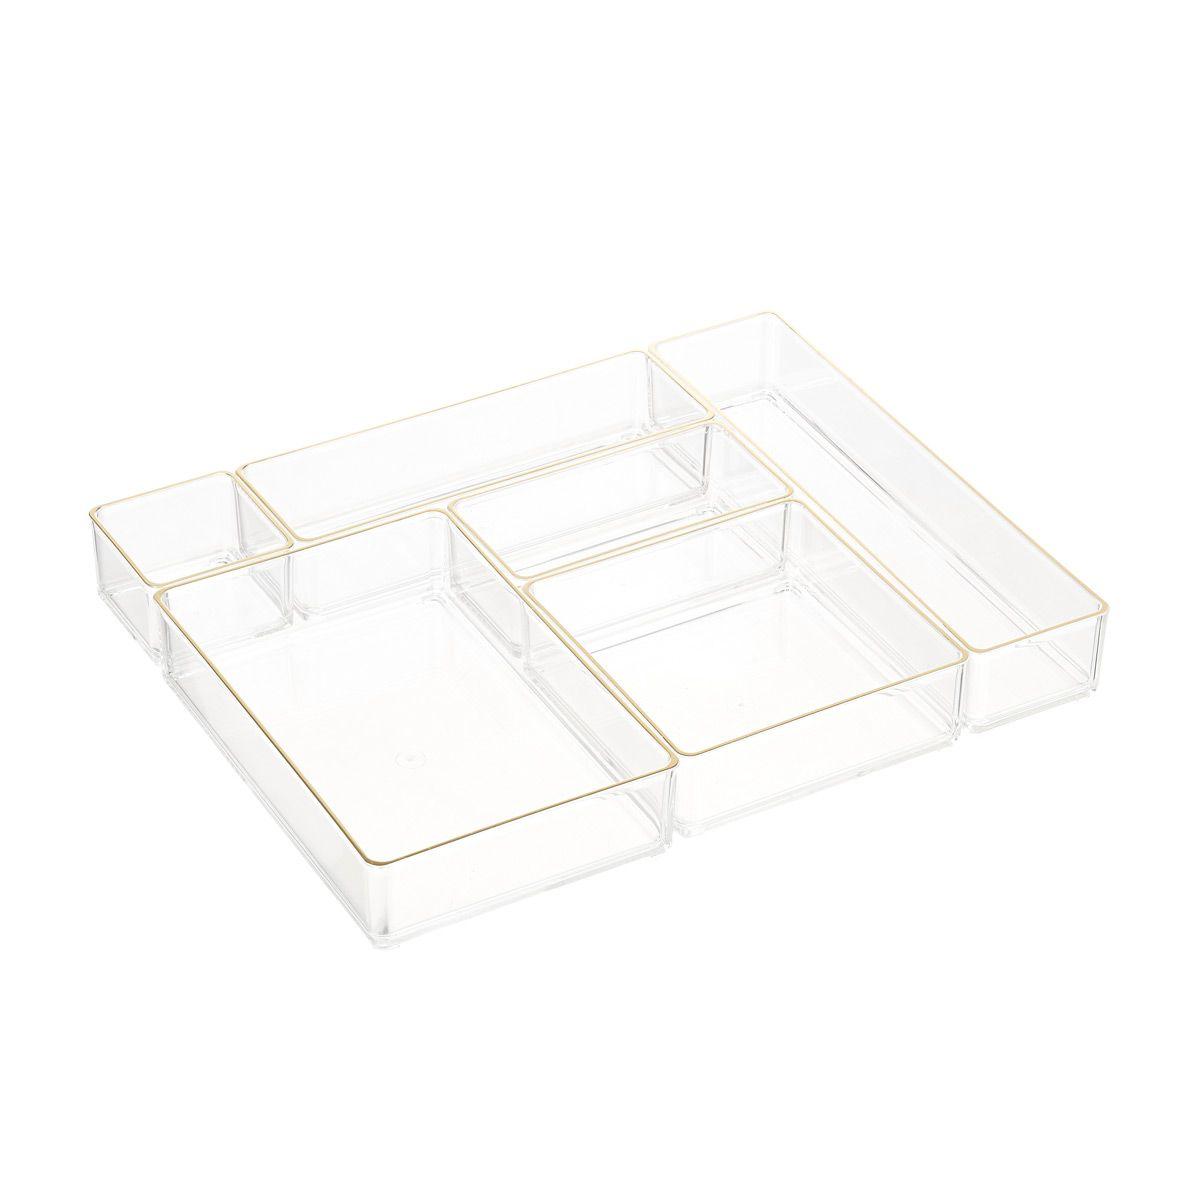 Acrylic Drawer Organizers Gold Trim Set Of 6 In 2020 Acrylic Drawer Organizer Drawer Organizers Desk Drawer Organisation